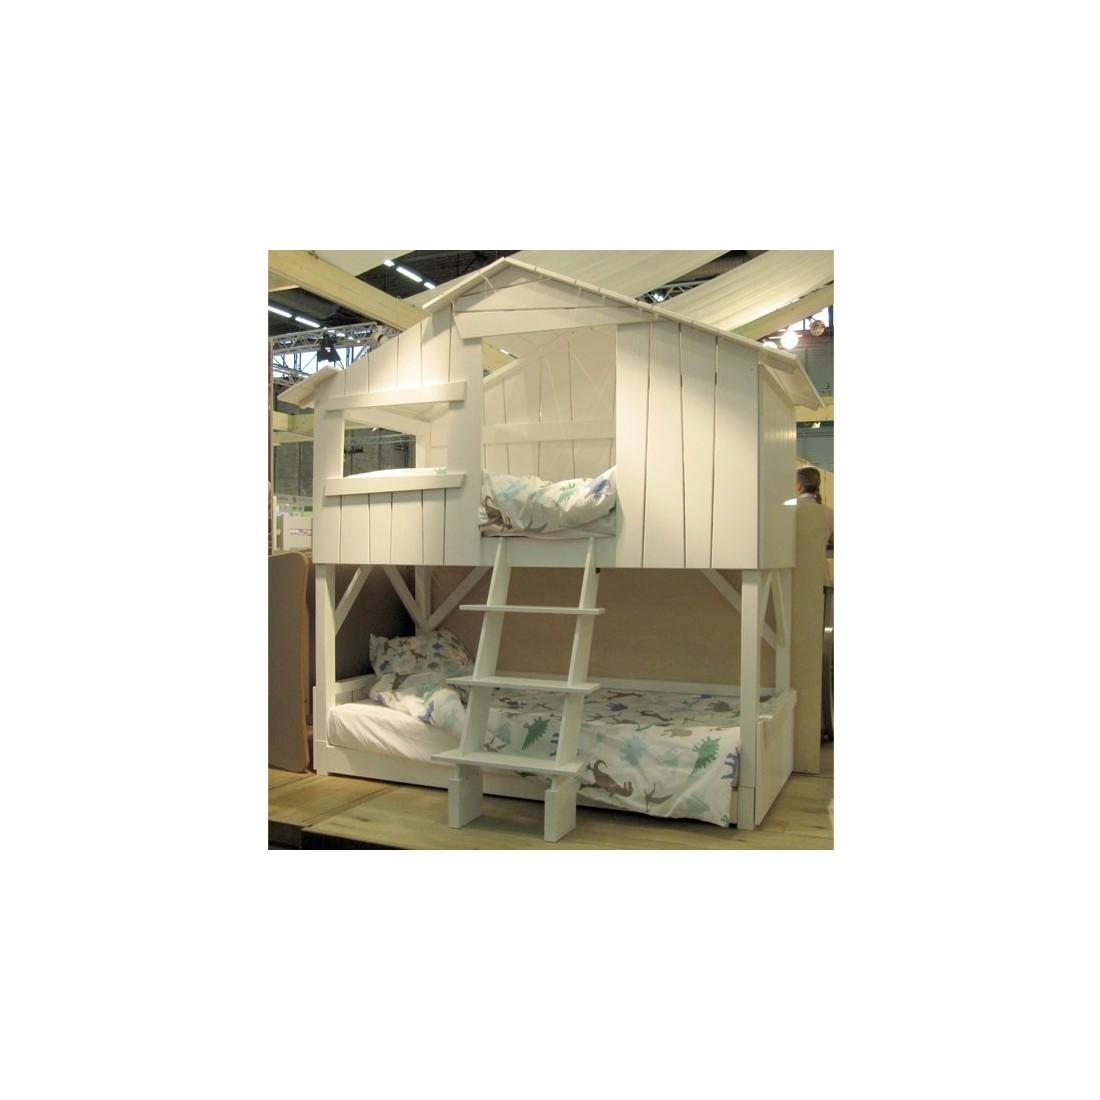 lit cabane enfant superpos coloris au choix mathy by bols ma chambramoi. Black Bedroom Furniture Sets. Home Design Ideas